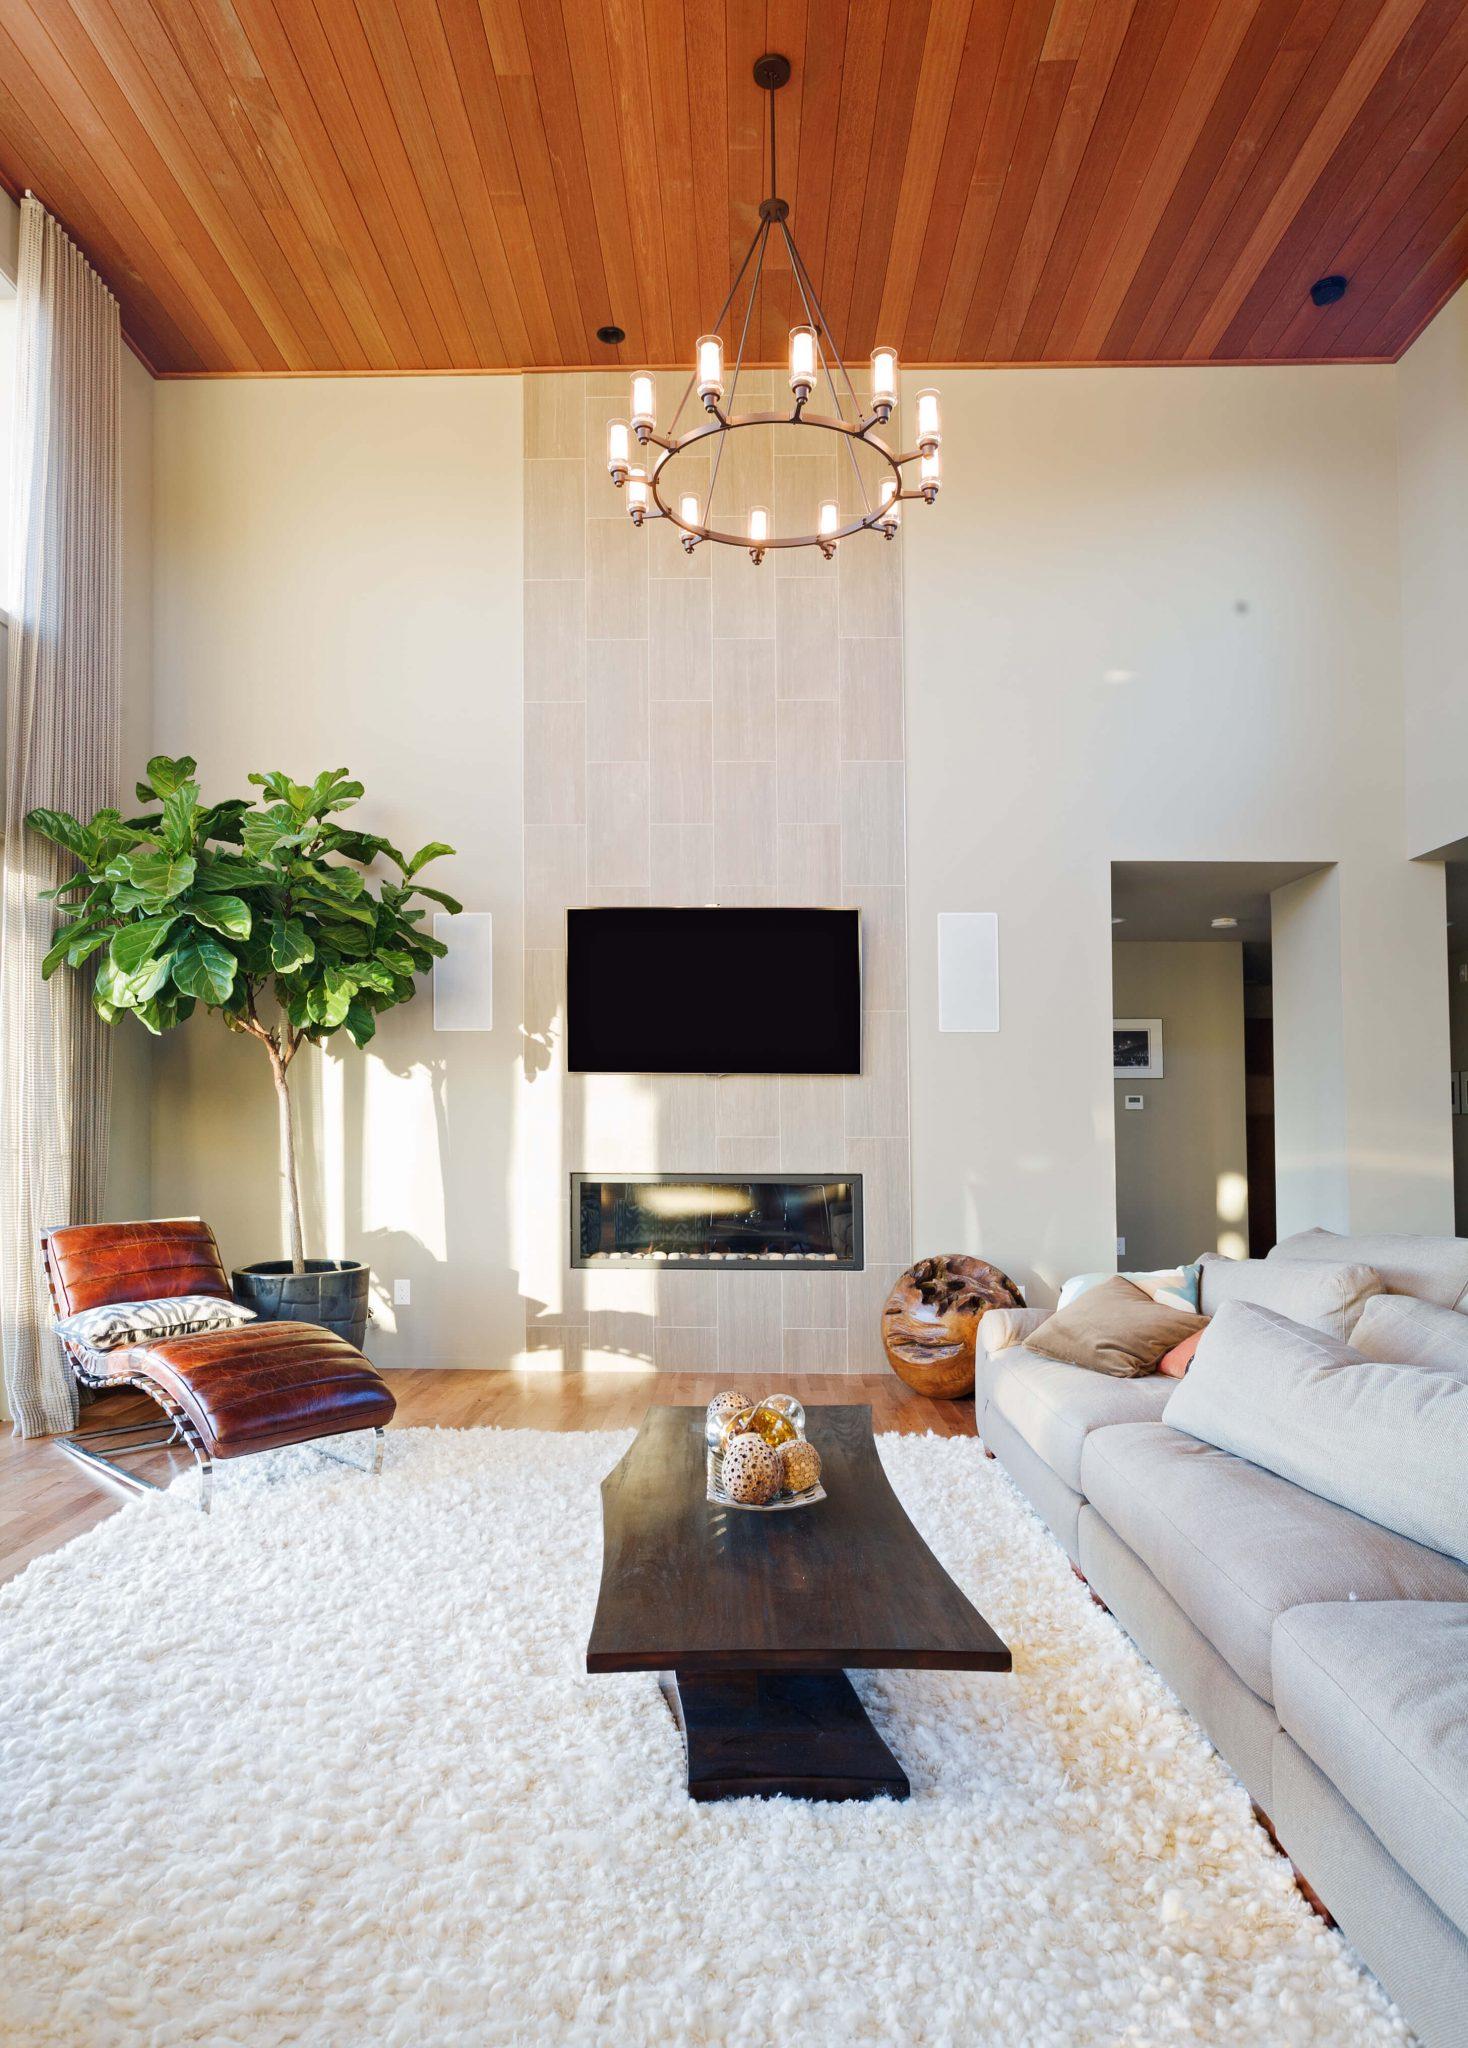 43 Light Amp Spacious Living Room Interior Design Ideas